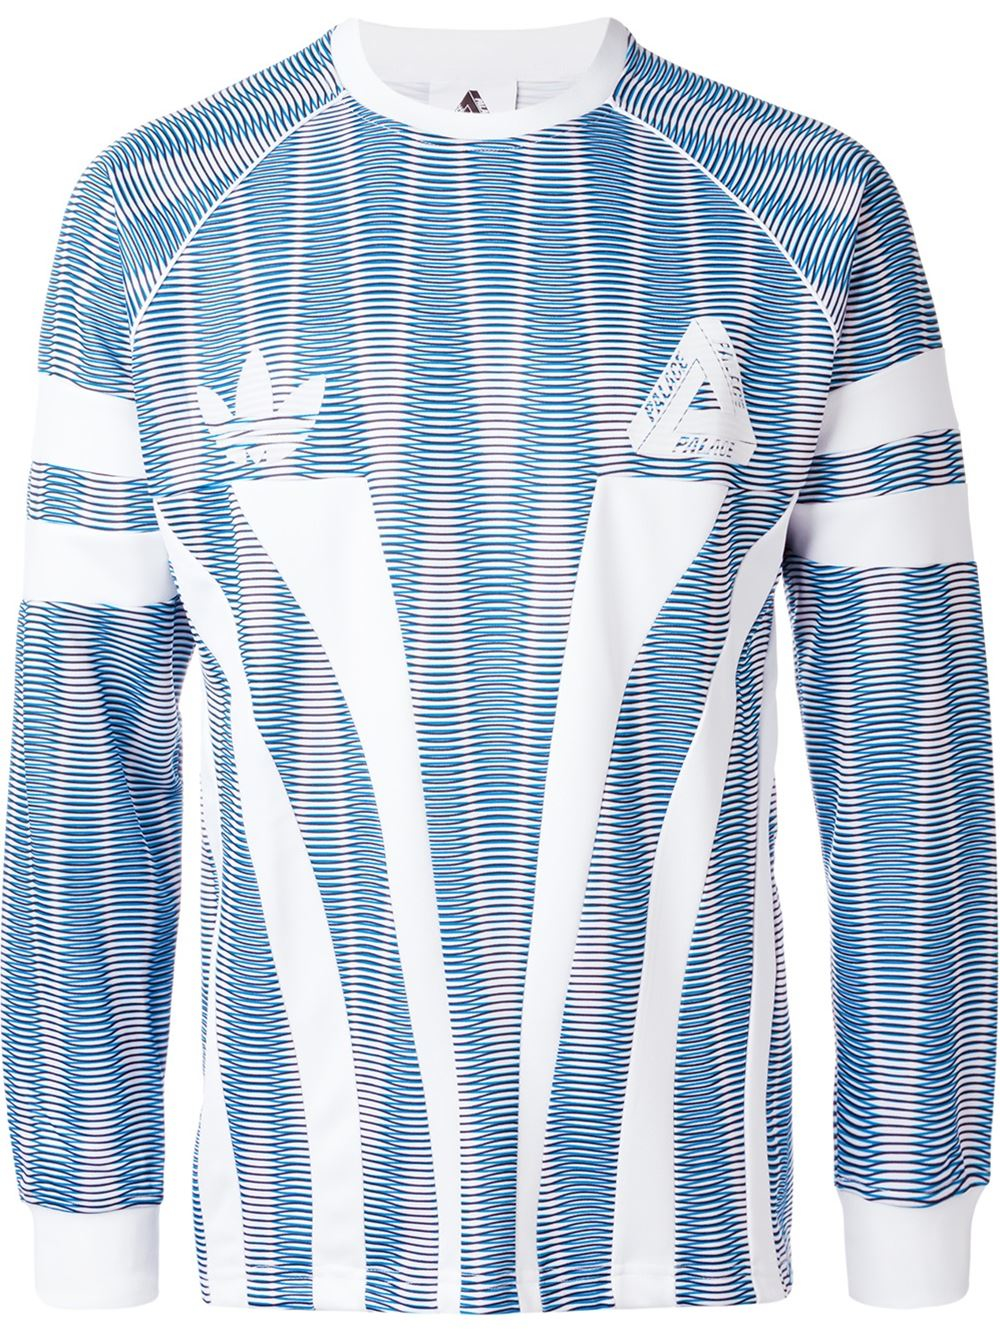 Palace x adidas Originals Crew Neck | Blue | Crewnecks